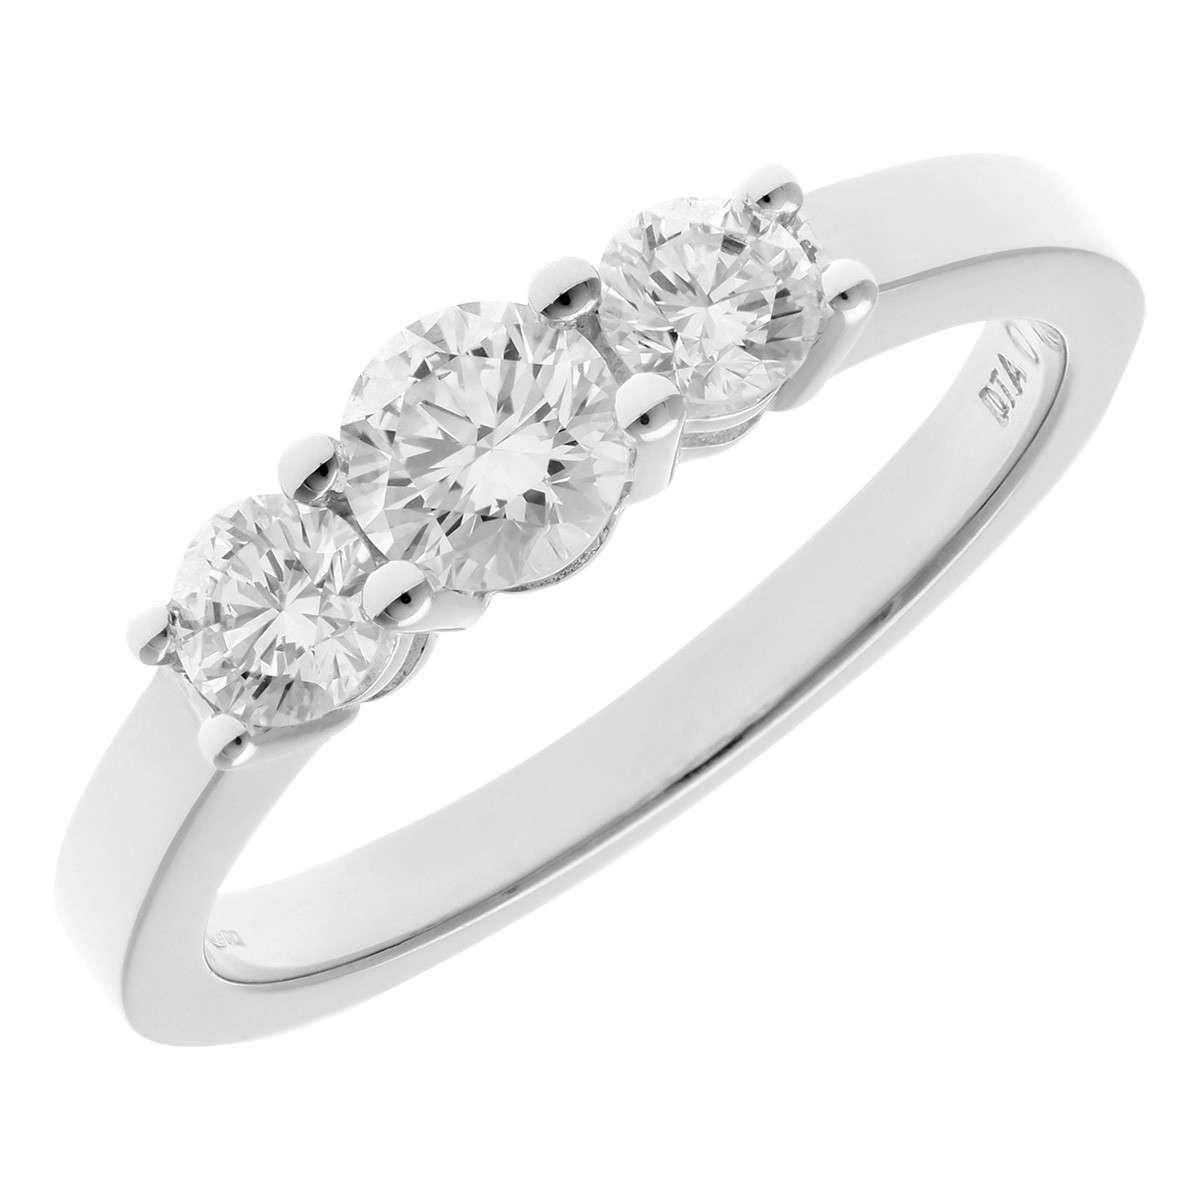 18CT WHITE GOLD 0.75CT DIAMOND 3 STONE RING